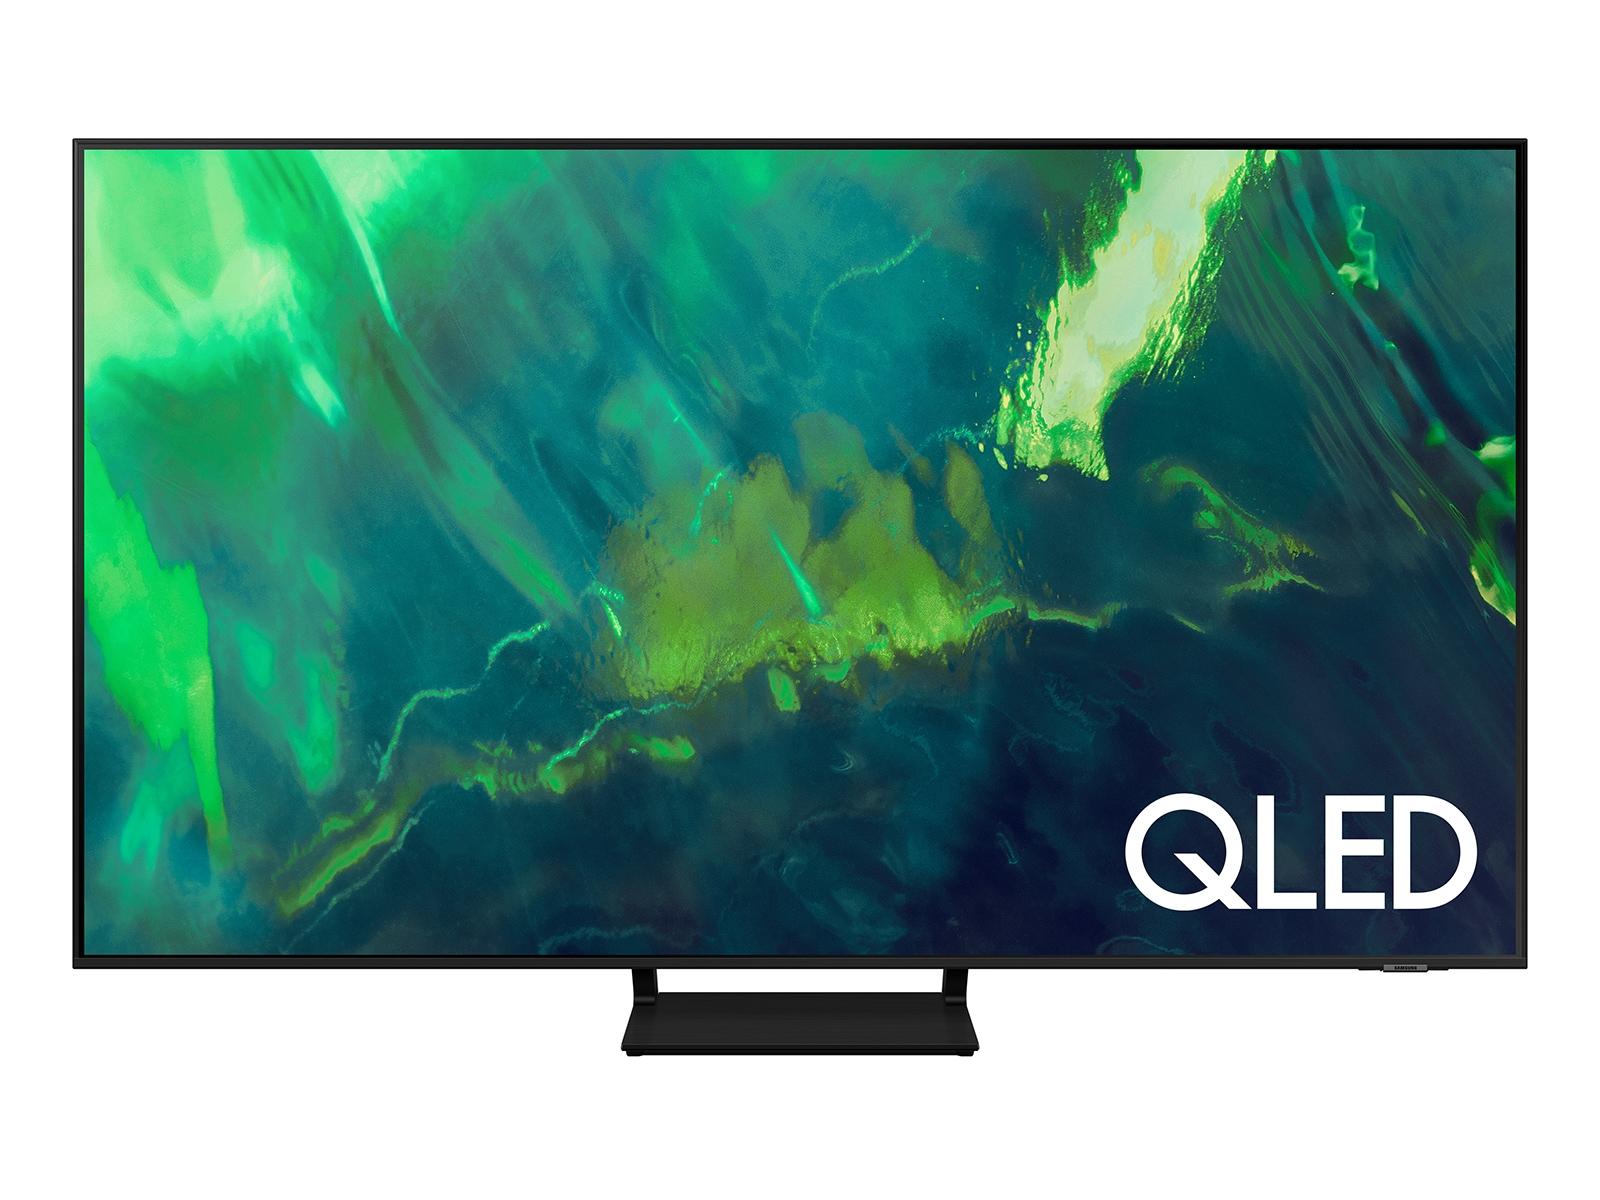 Samsung 55 Q70A QLED 4K Smart TV, QN55Q70AAFXZA, 2021